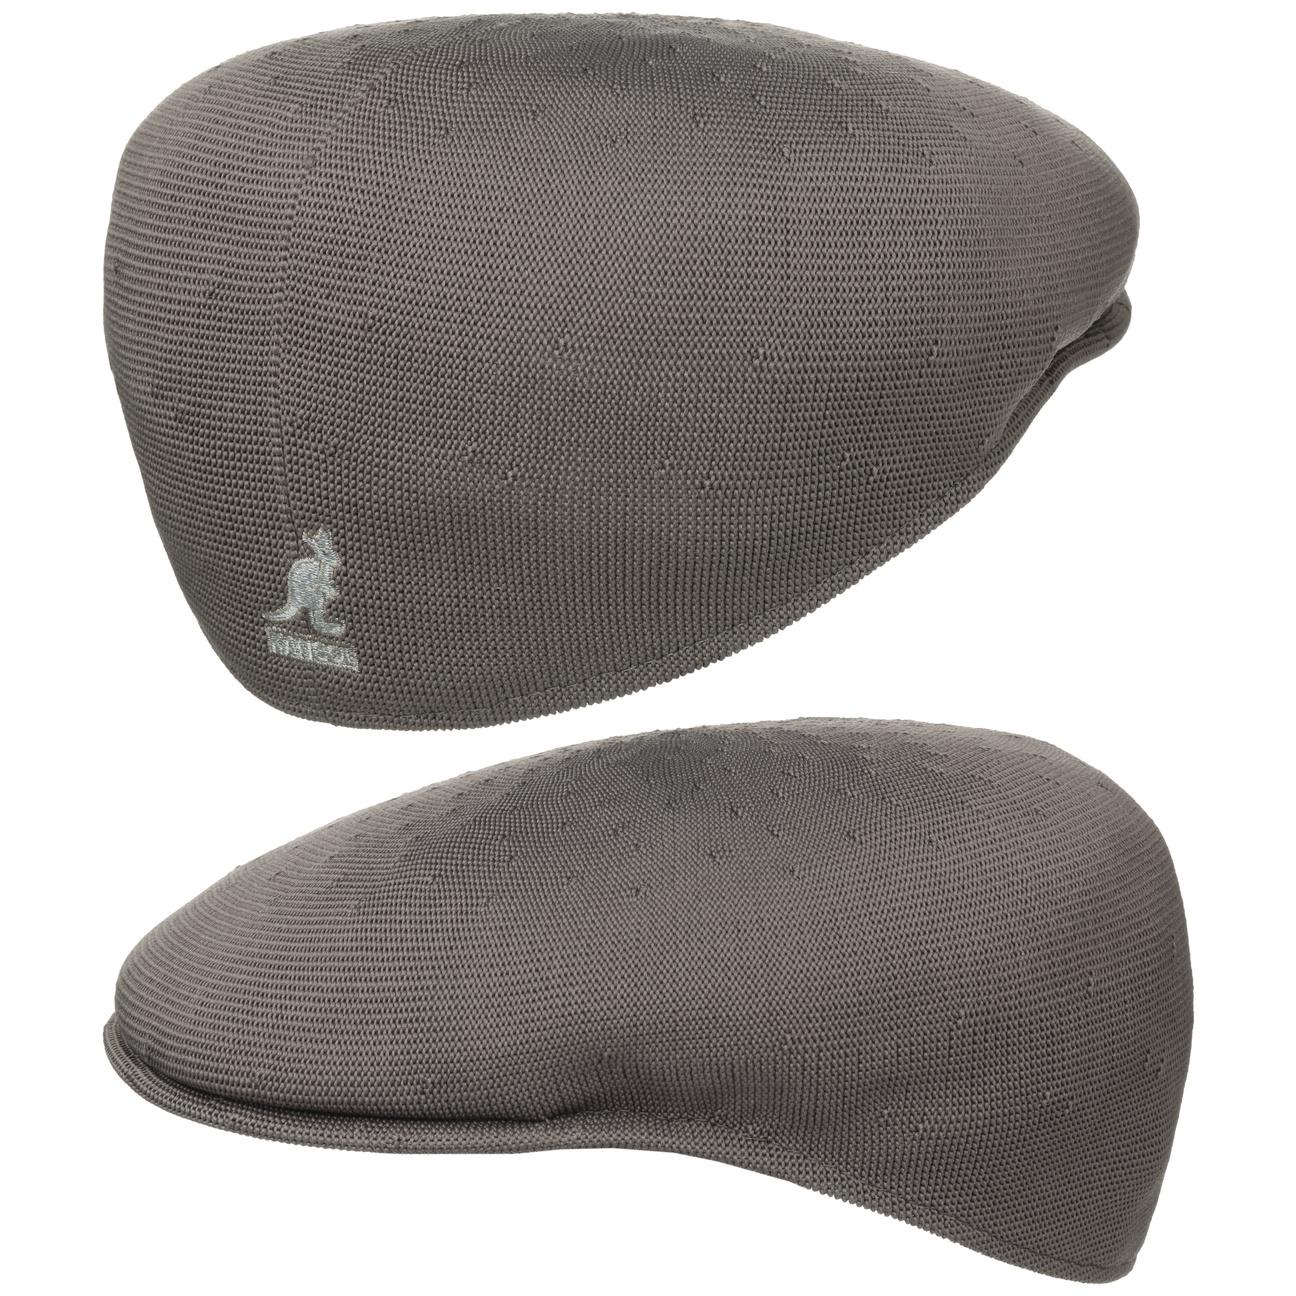 Gorra Gatsby Kangol Tropic 504 - Gorras - sombreroshop.es 47d4f6e1d0e